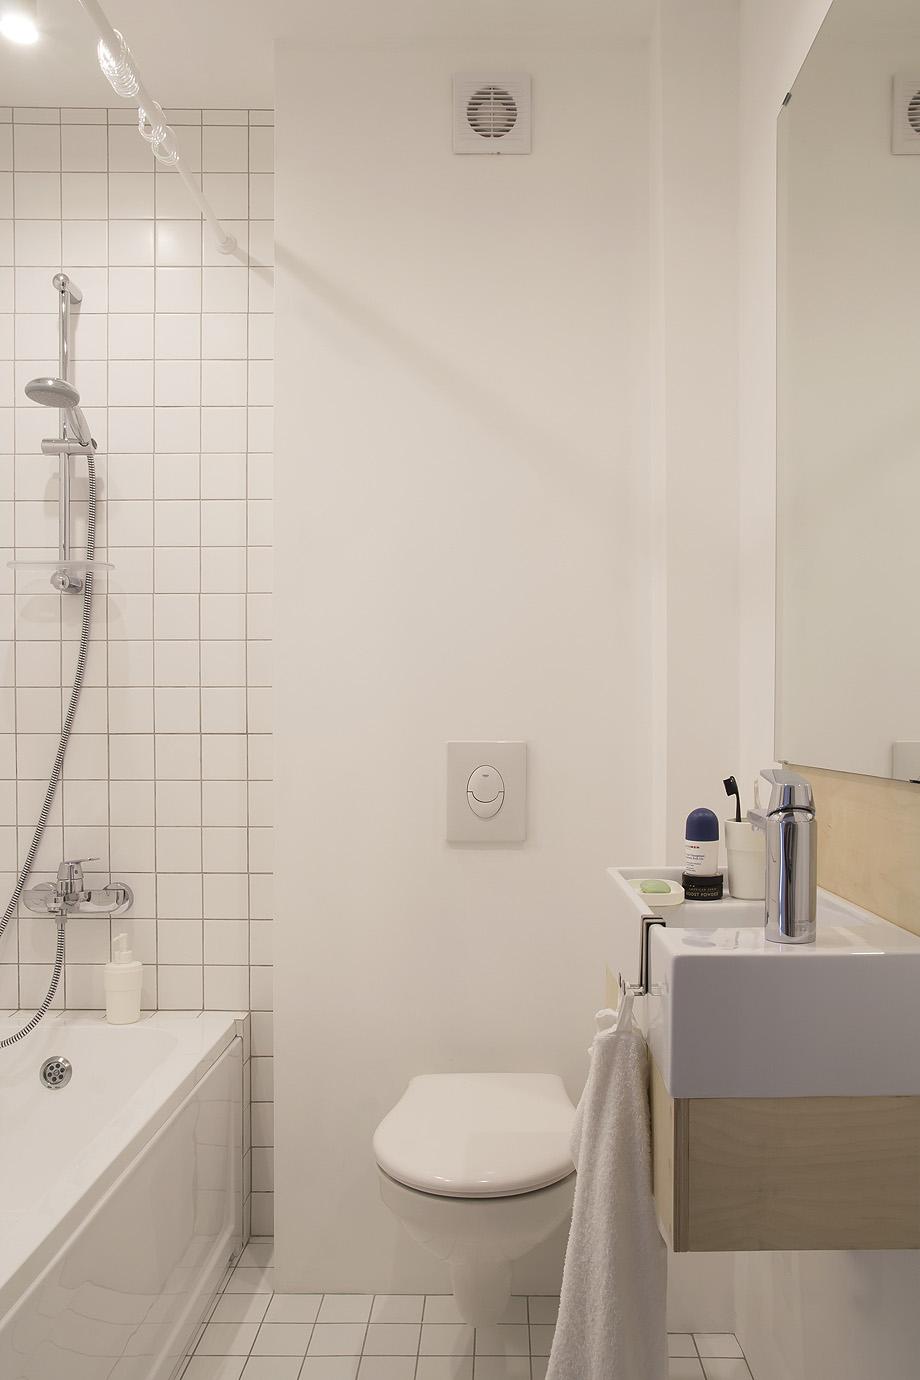 apartamento en rusia por kdva architects - foto daria koloskova (16)